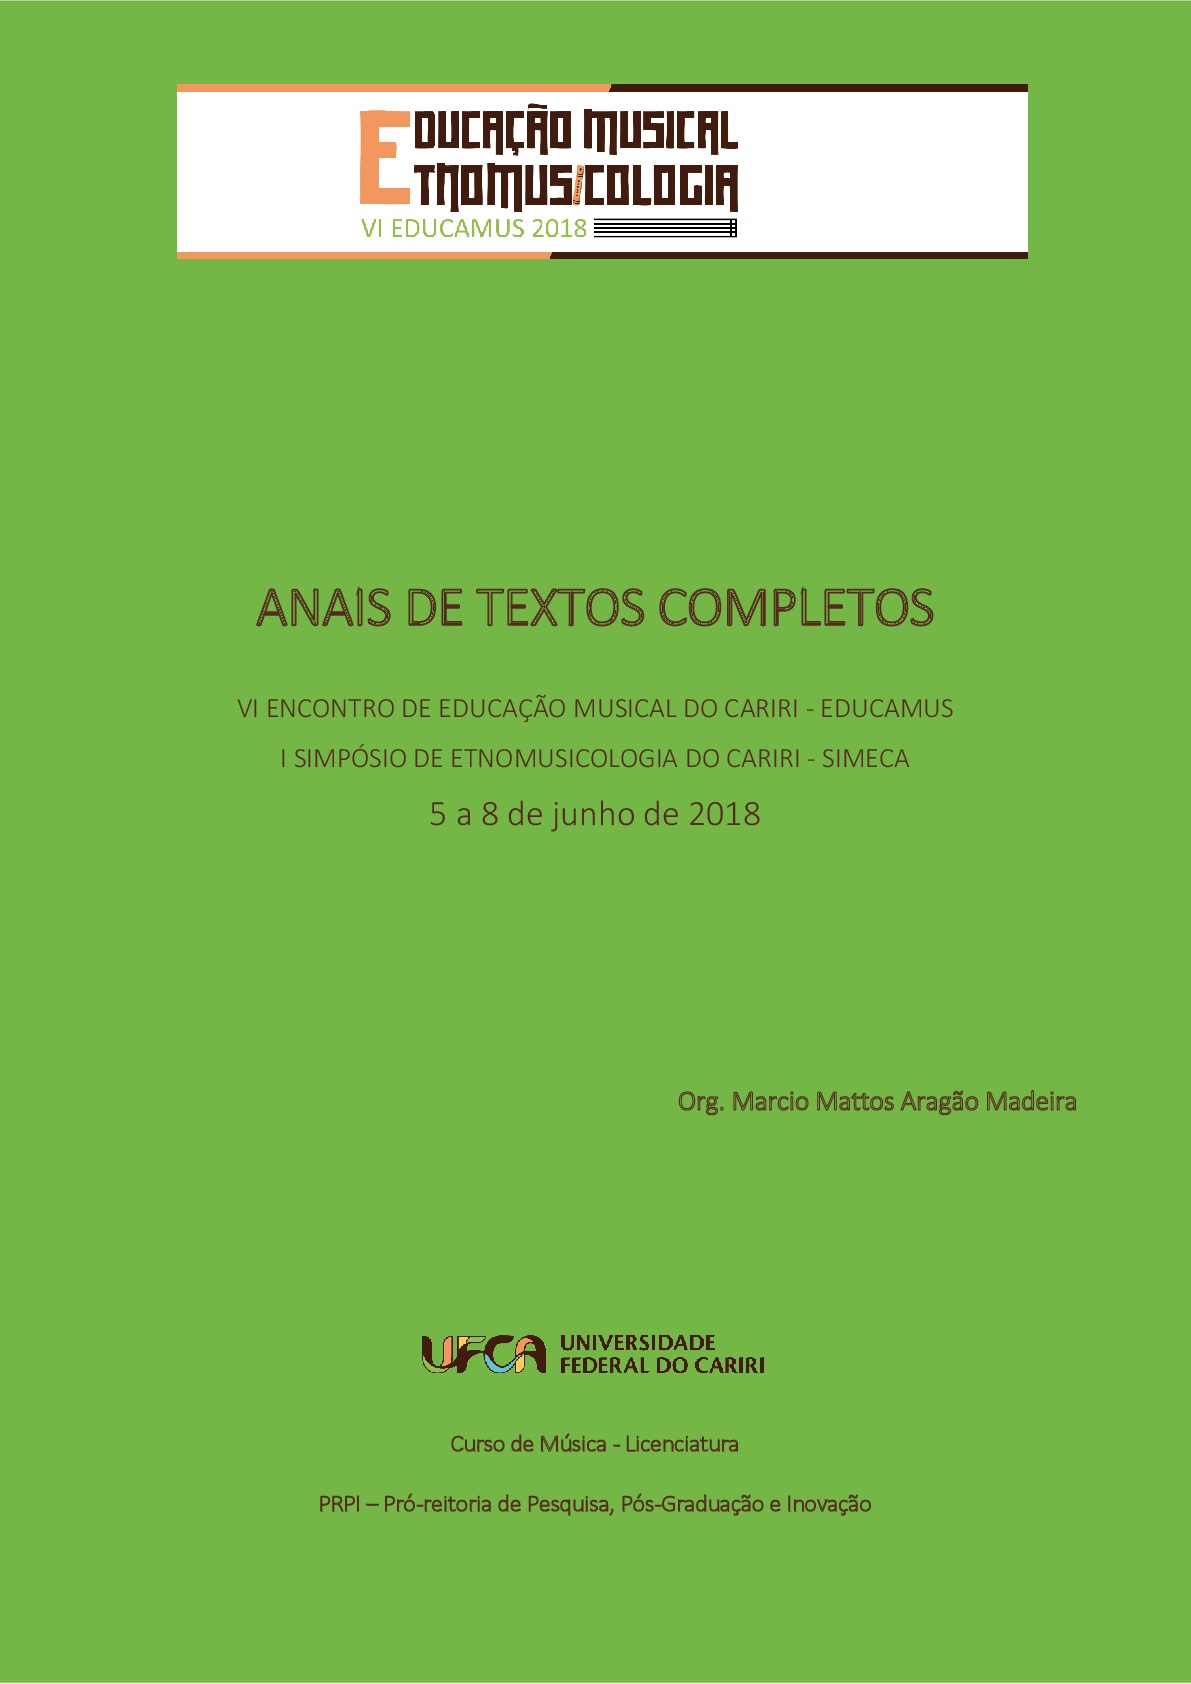 VI ENCONTRO DE EDUCAÇÃO MUSICAL DO CARIRI – EDUCAMUS & I SIMPÓSIO DE ETNOMUSICOLOGIA DO CARIRI – SIMECA thumbnail